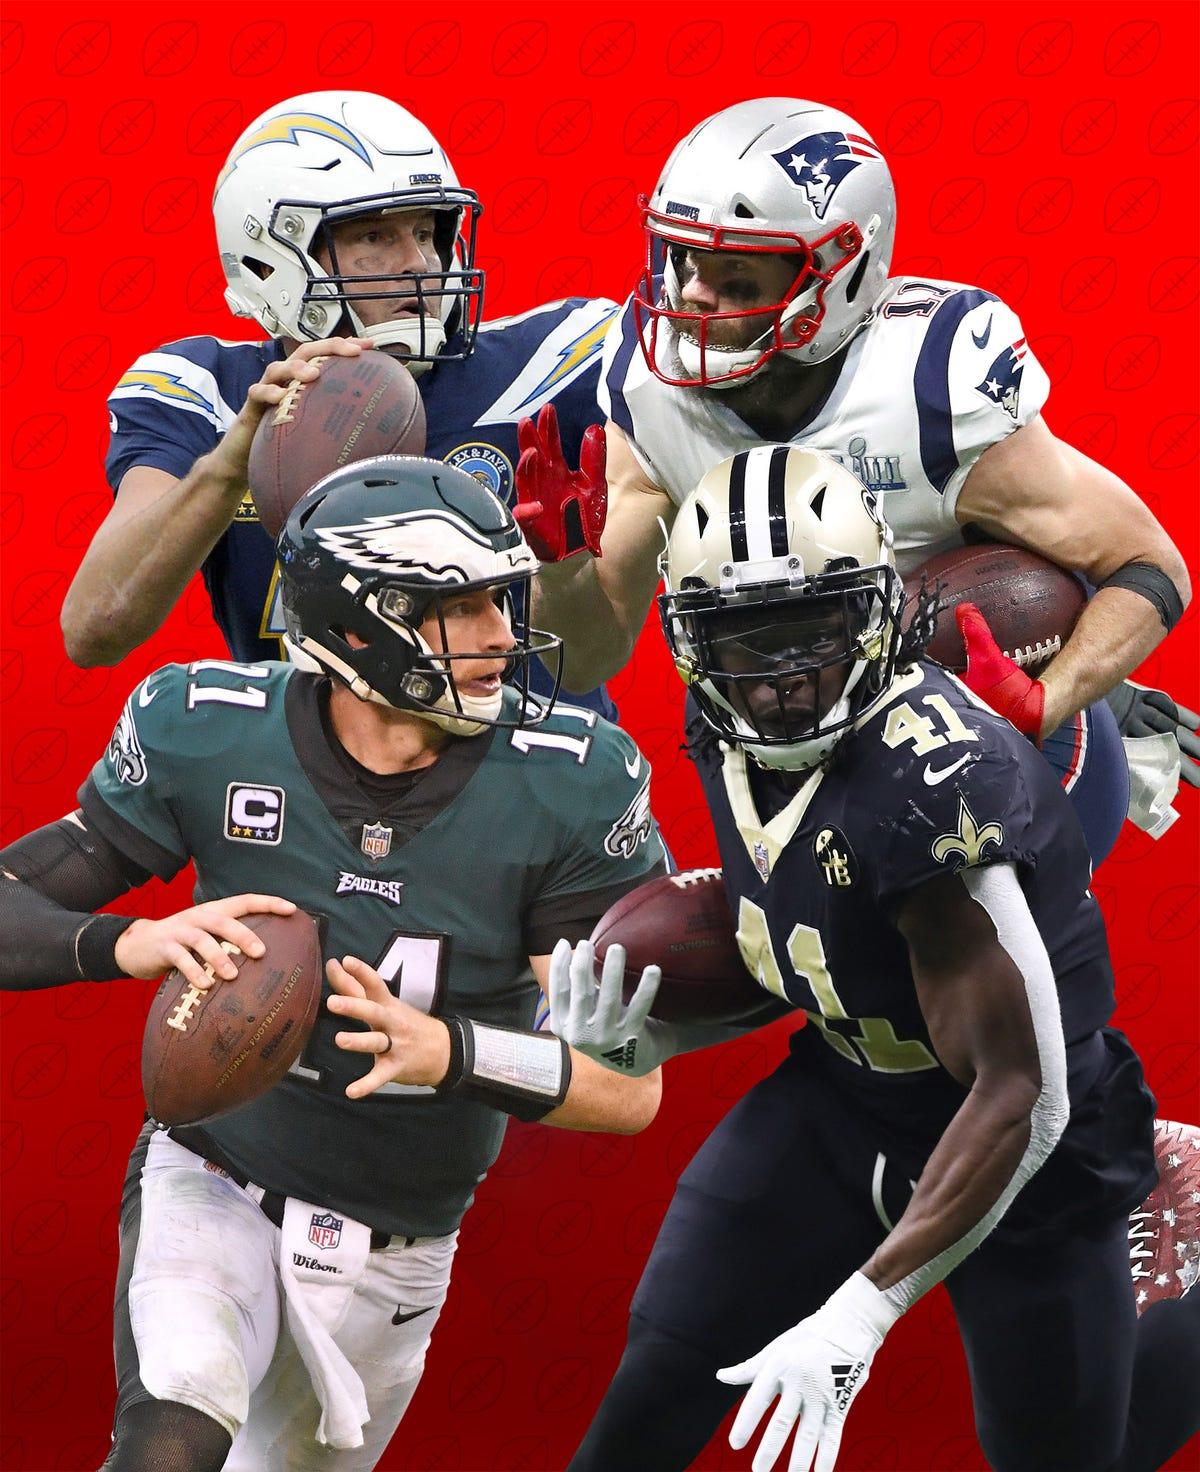 ce63c77c 2019 NFL record predictions: Will Patriots return to Super Bowl?